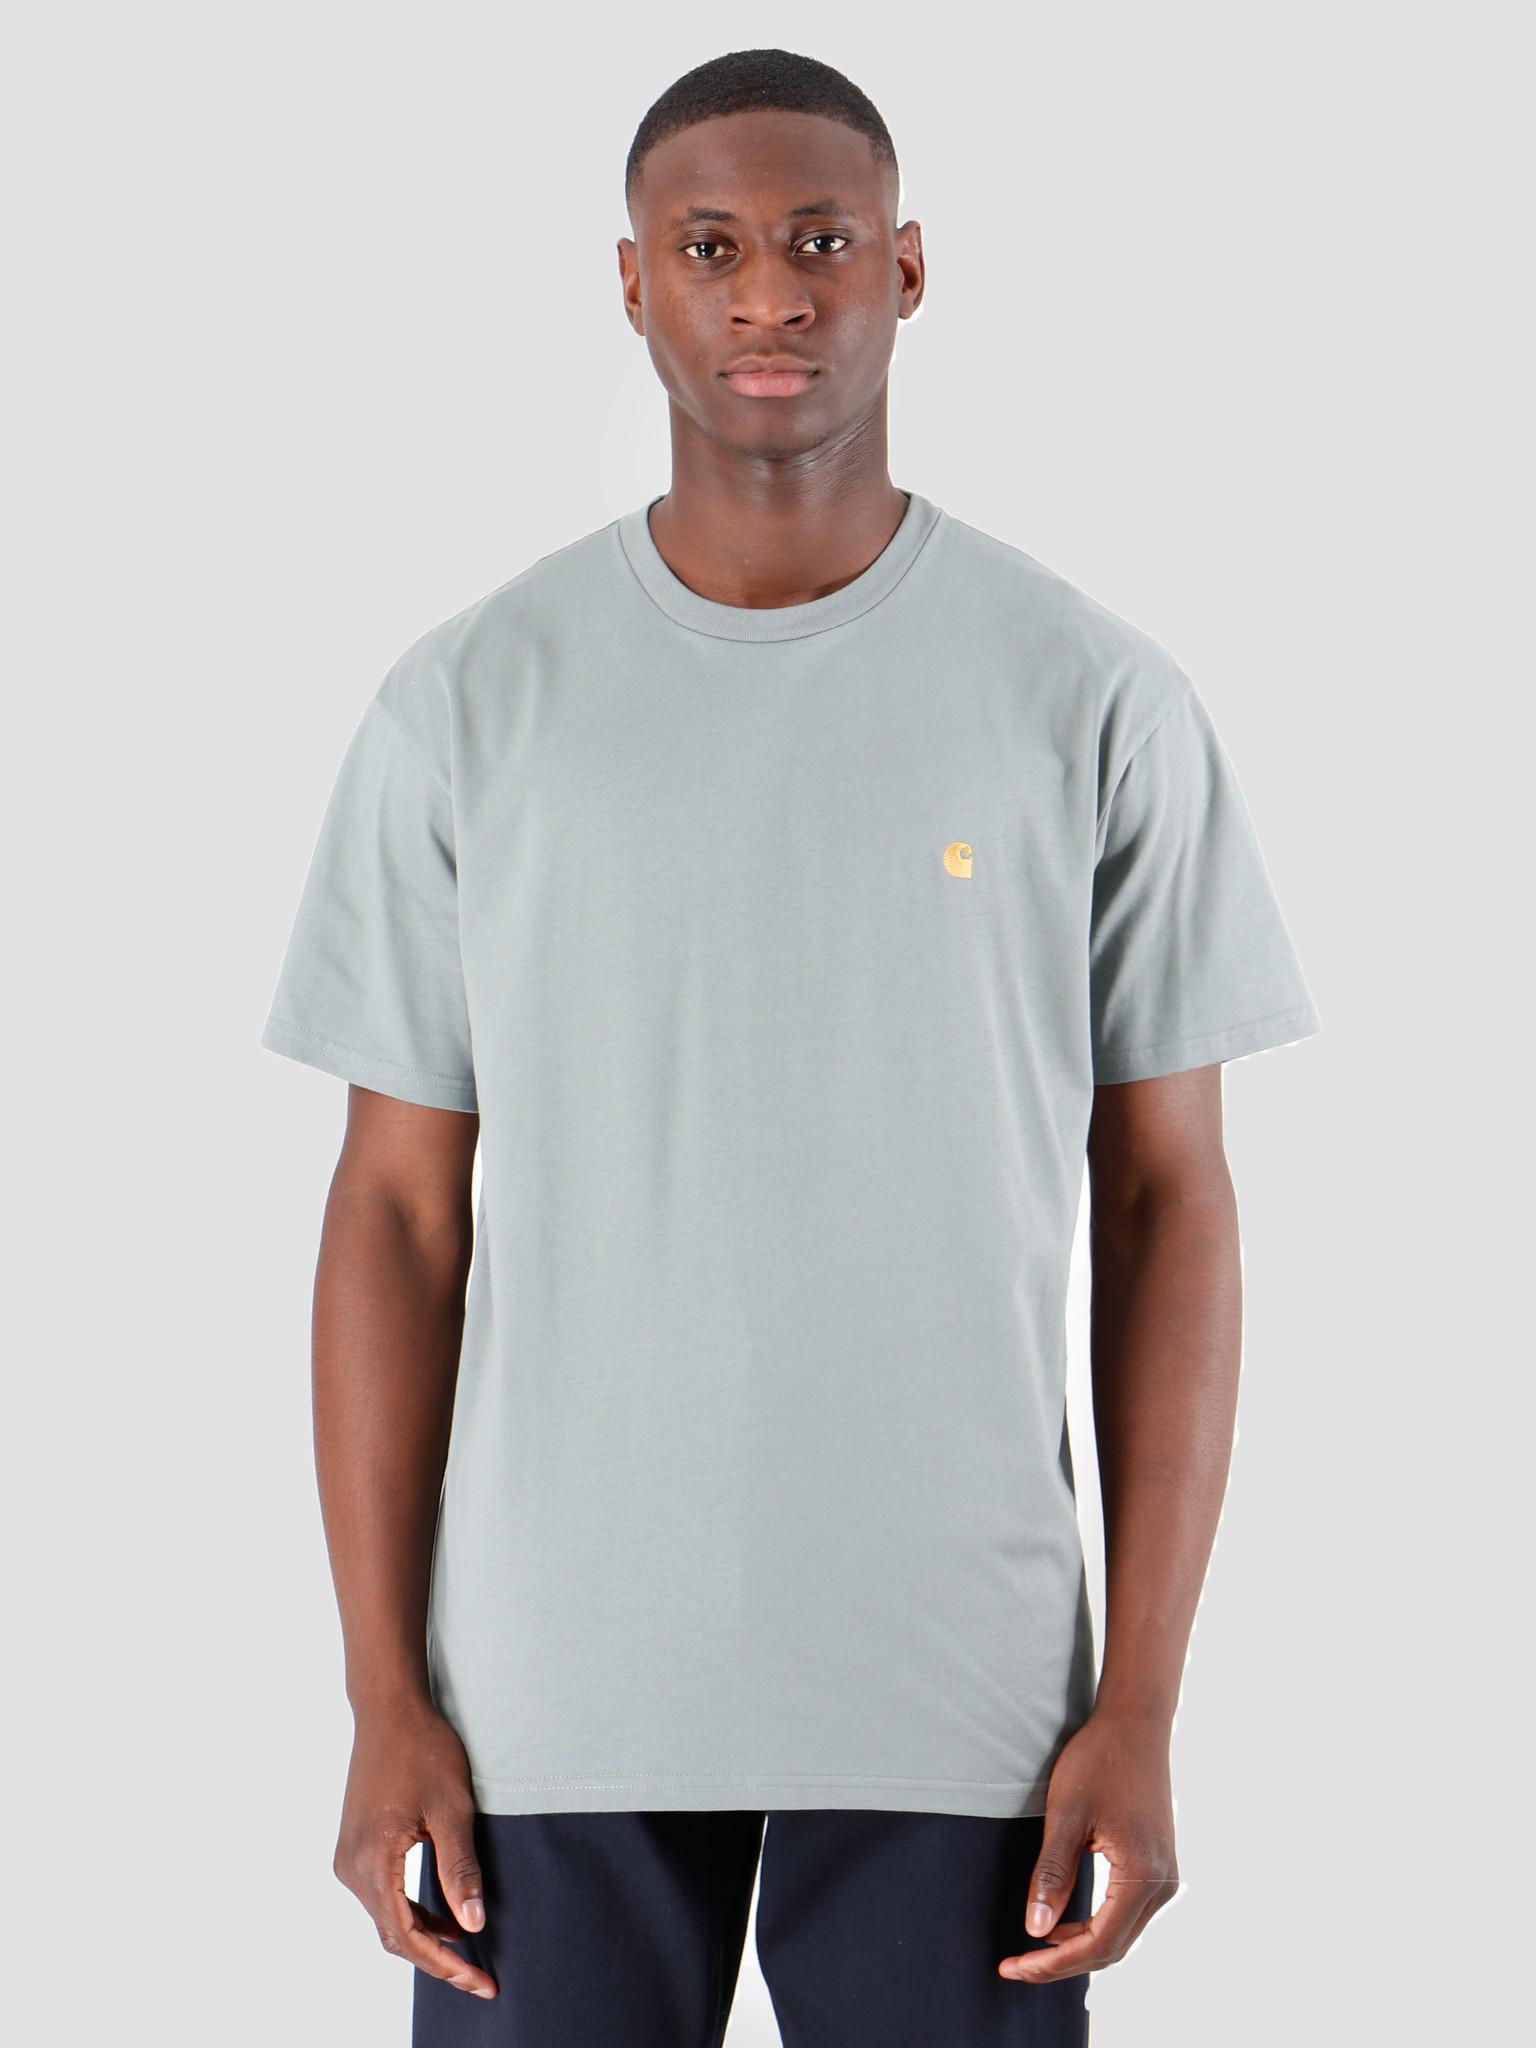 Carhartt WIP Carhartt WIP Chase T Shirt Cloudy Gold I026391